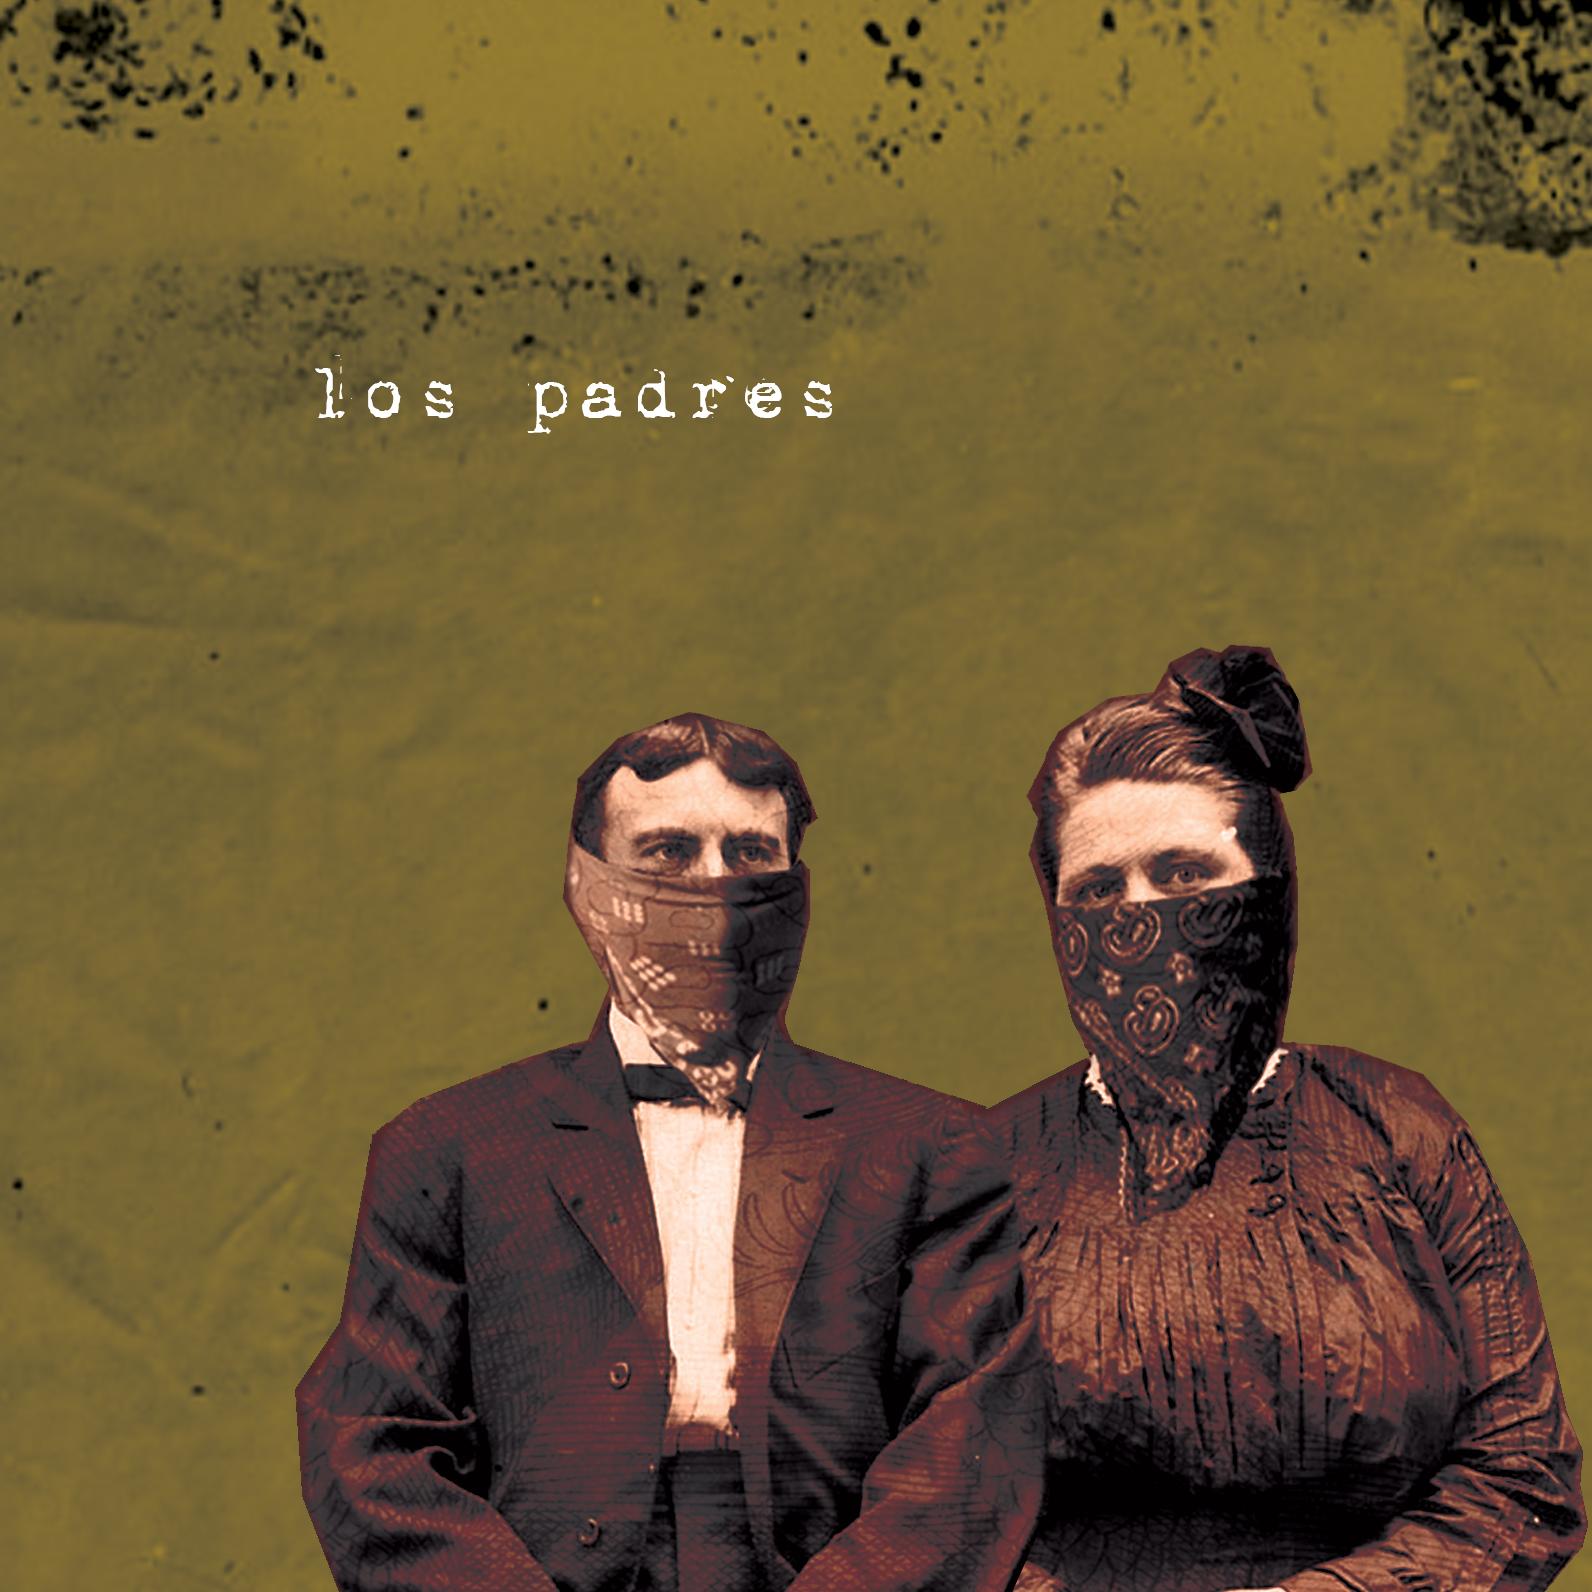 LOS PADRES - Self-Titled